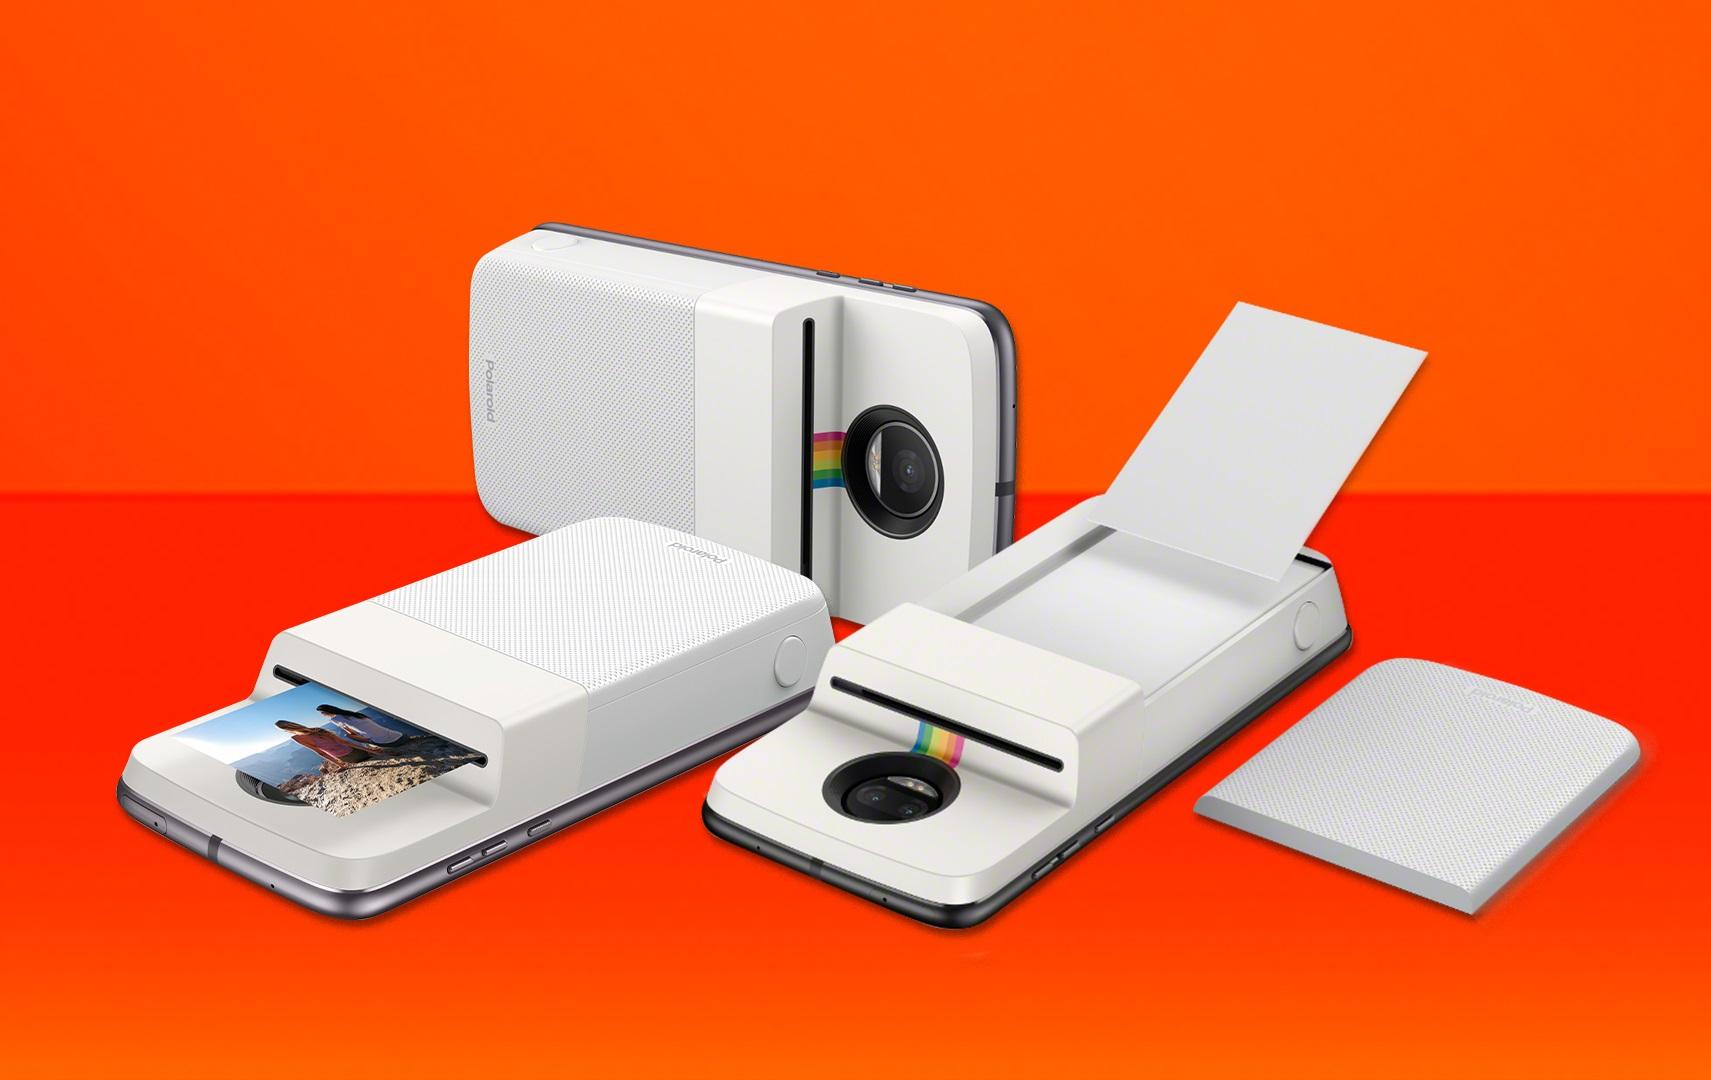 Color printing lowyat - Color Printing Lowyat 1